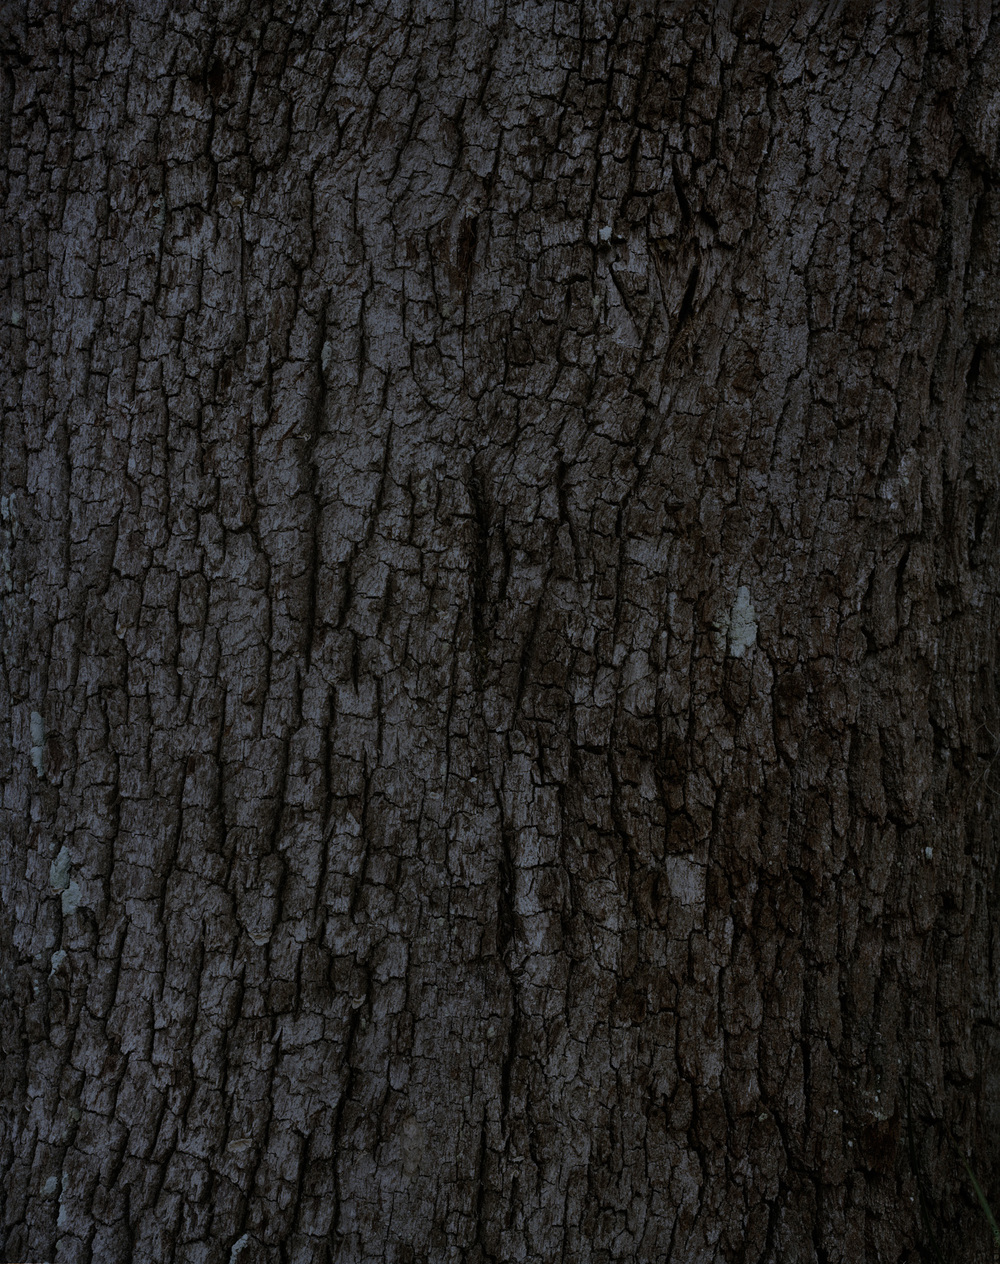 bark 10 016.jpg